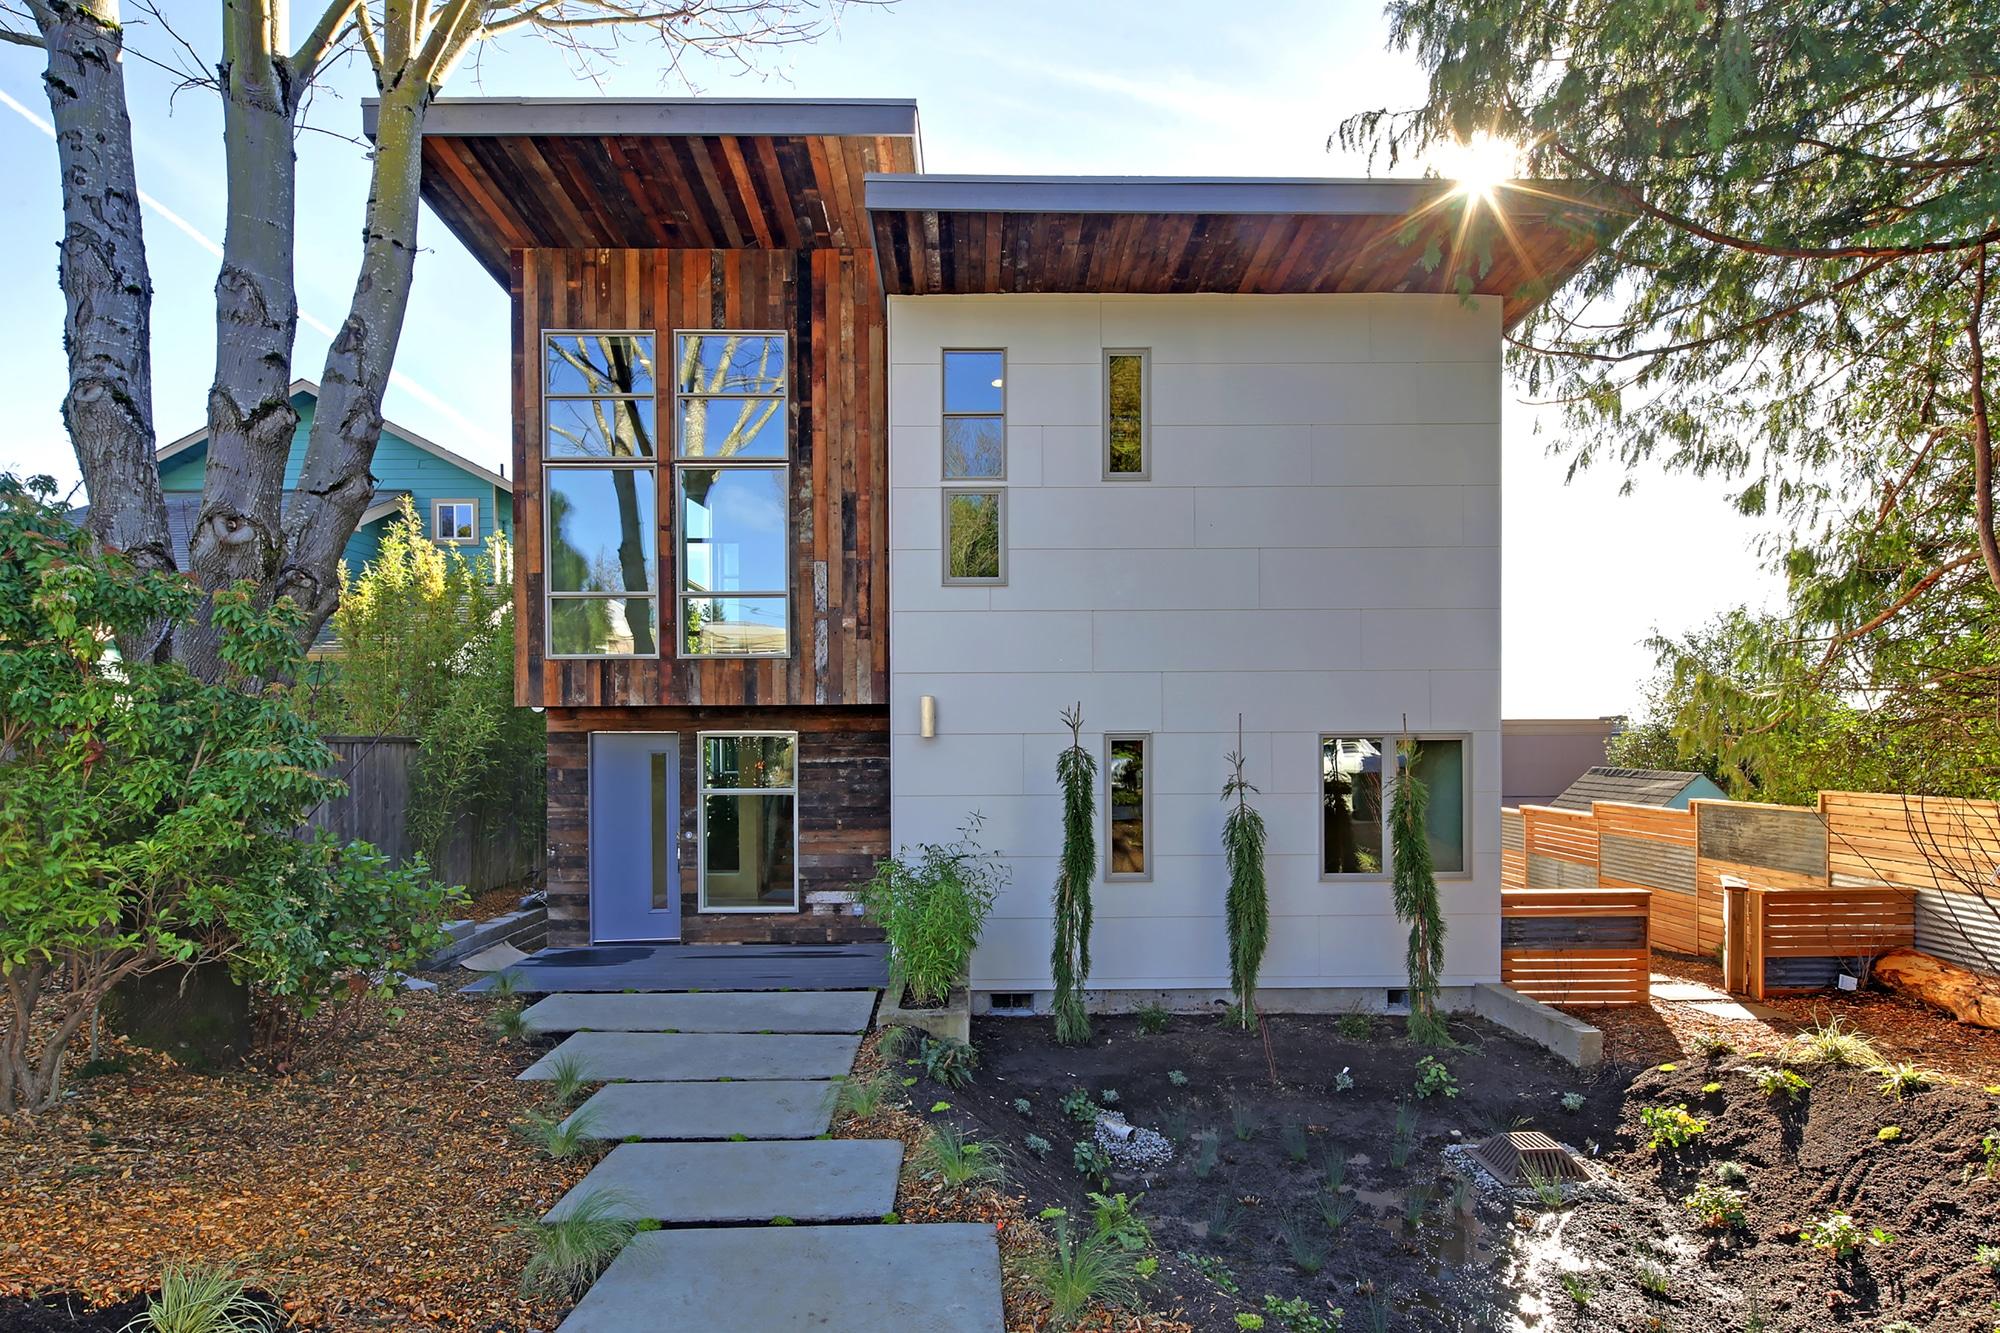 Diseo casa ecolgica autosuficiente Planos